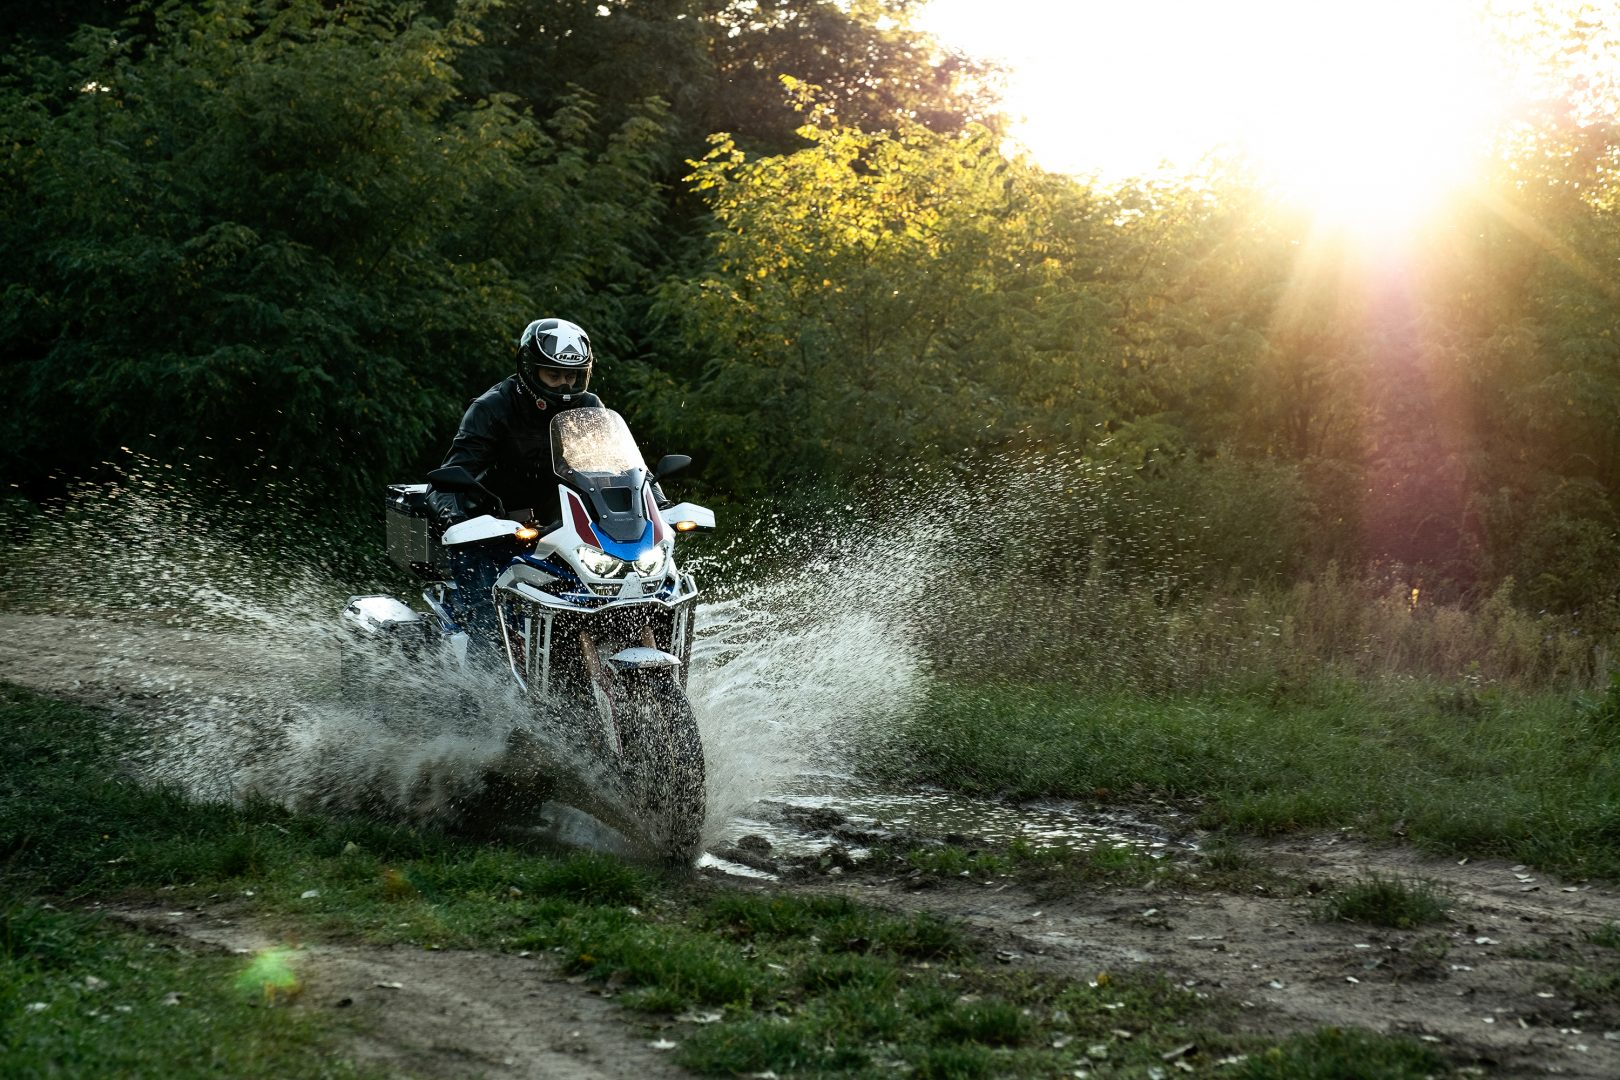 honda africa twin 1100 2020 2021 adventure sports test recenze recenzia motocyklov moto testy Daniel Chovanec pretekar zavodnik